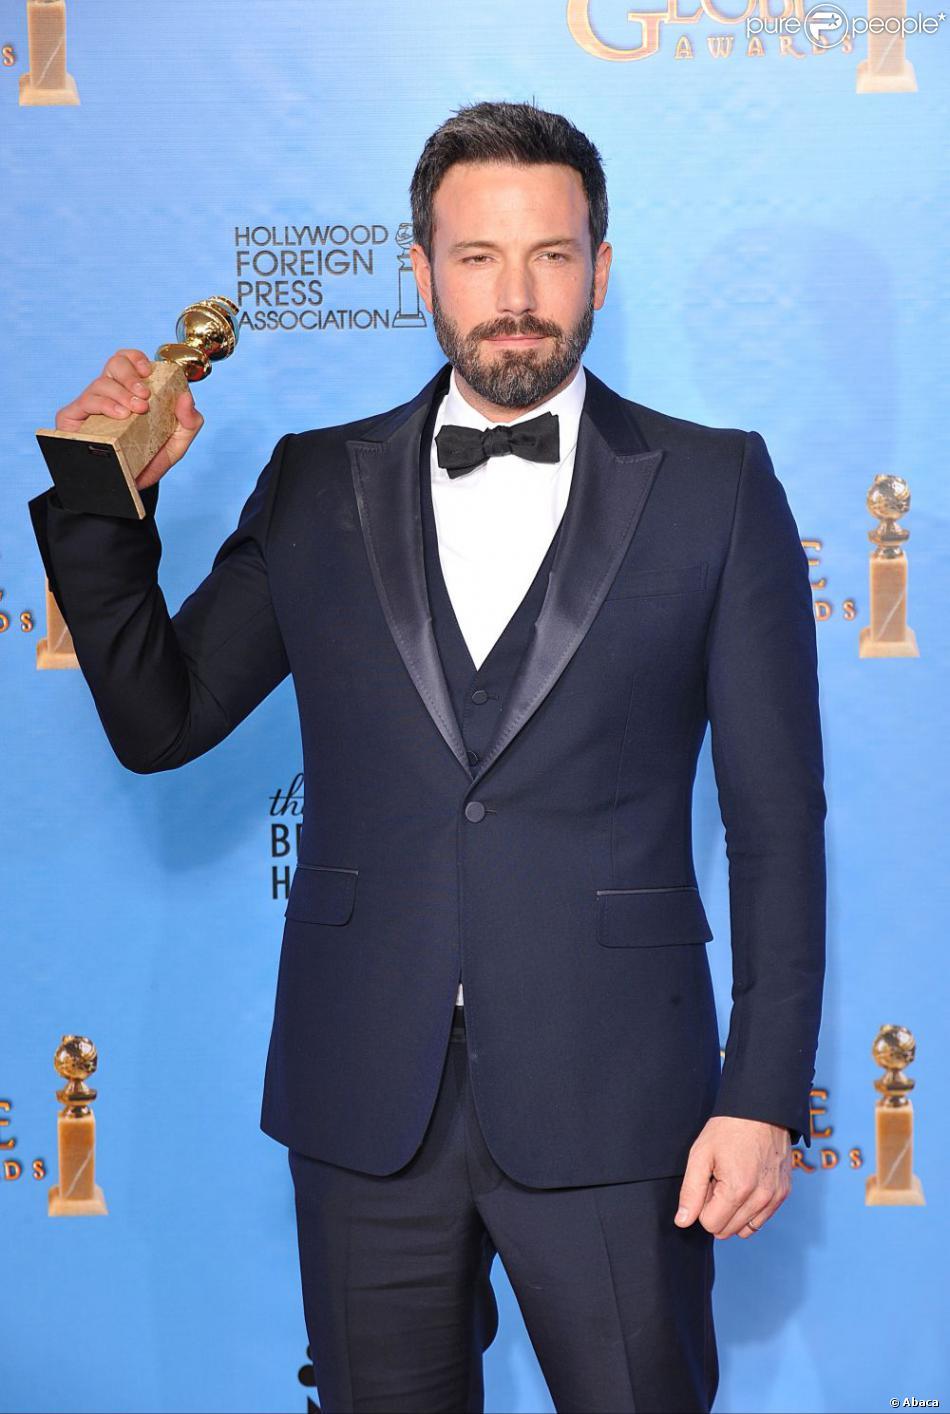 Ben Affleck (Argo), élu meilleur réalisateur aux Golden Globes 2013.